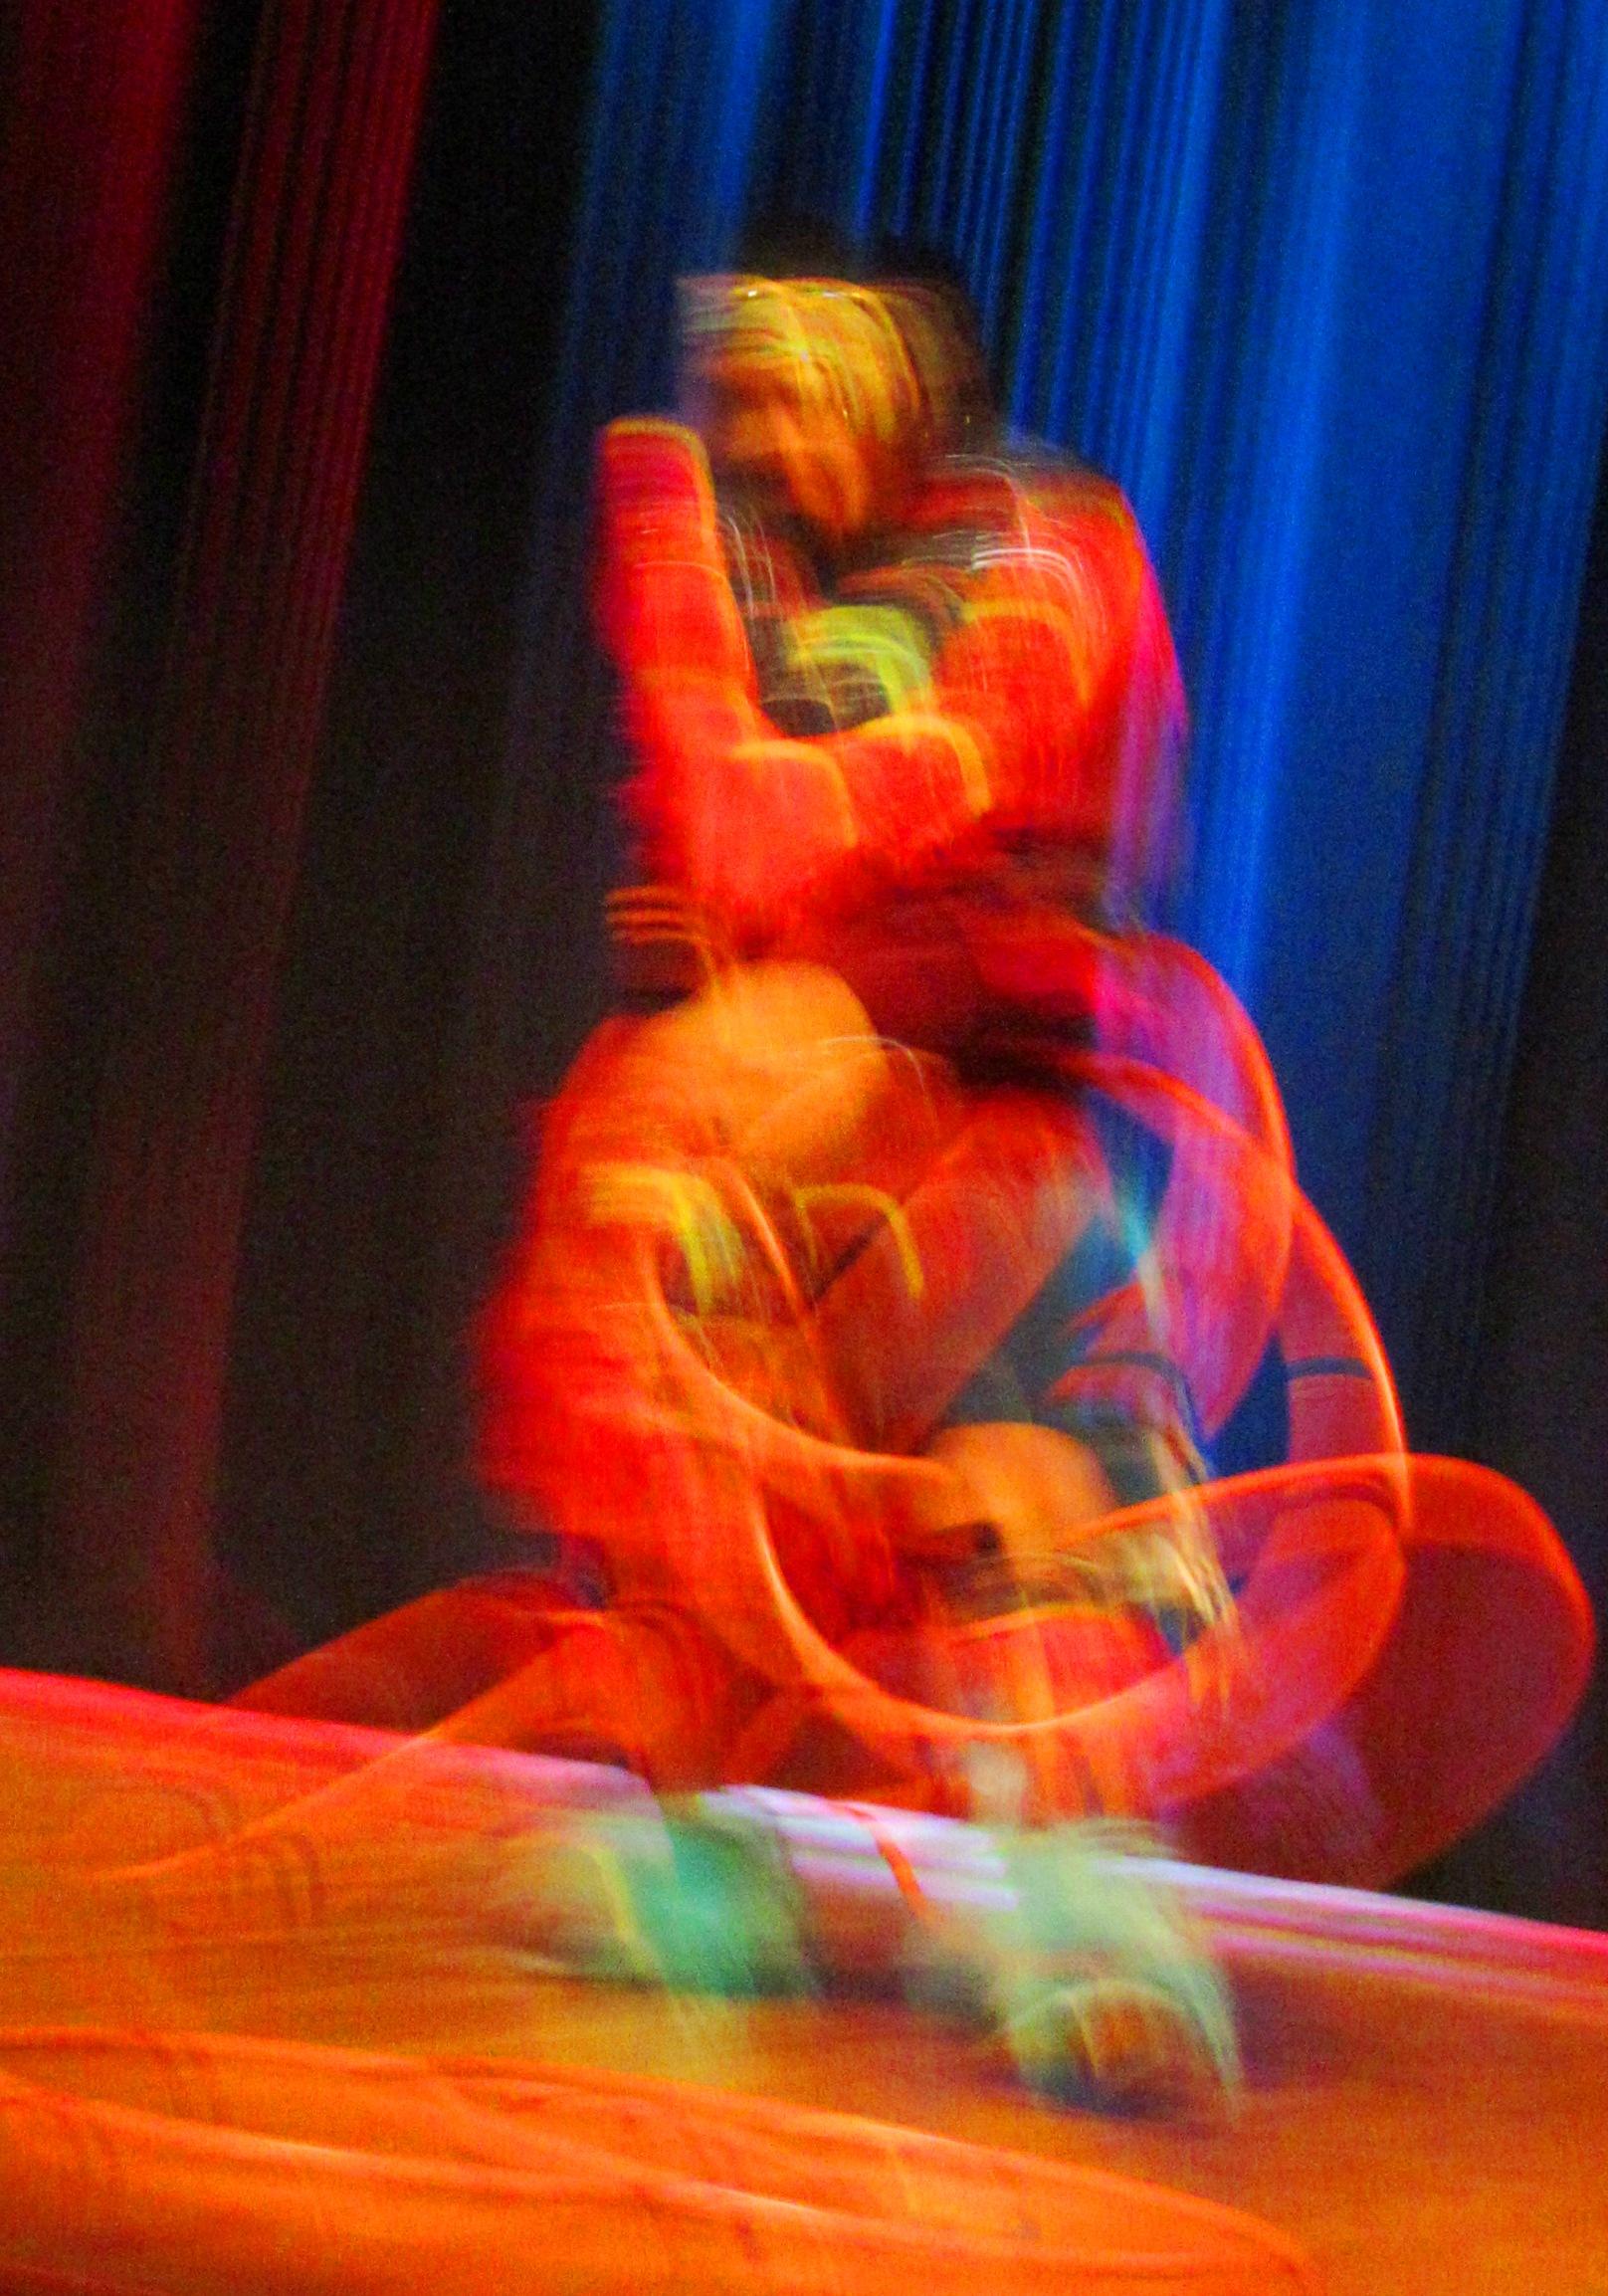 Hoop dancer Nimkii Osawamick